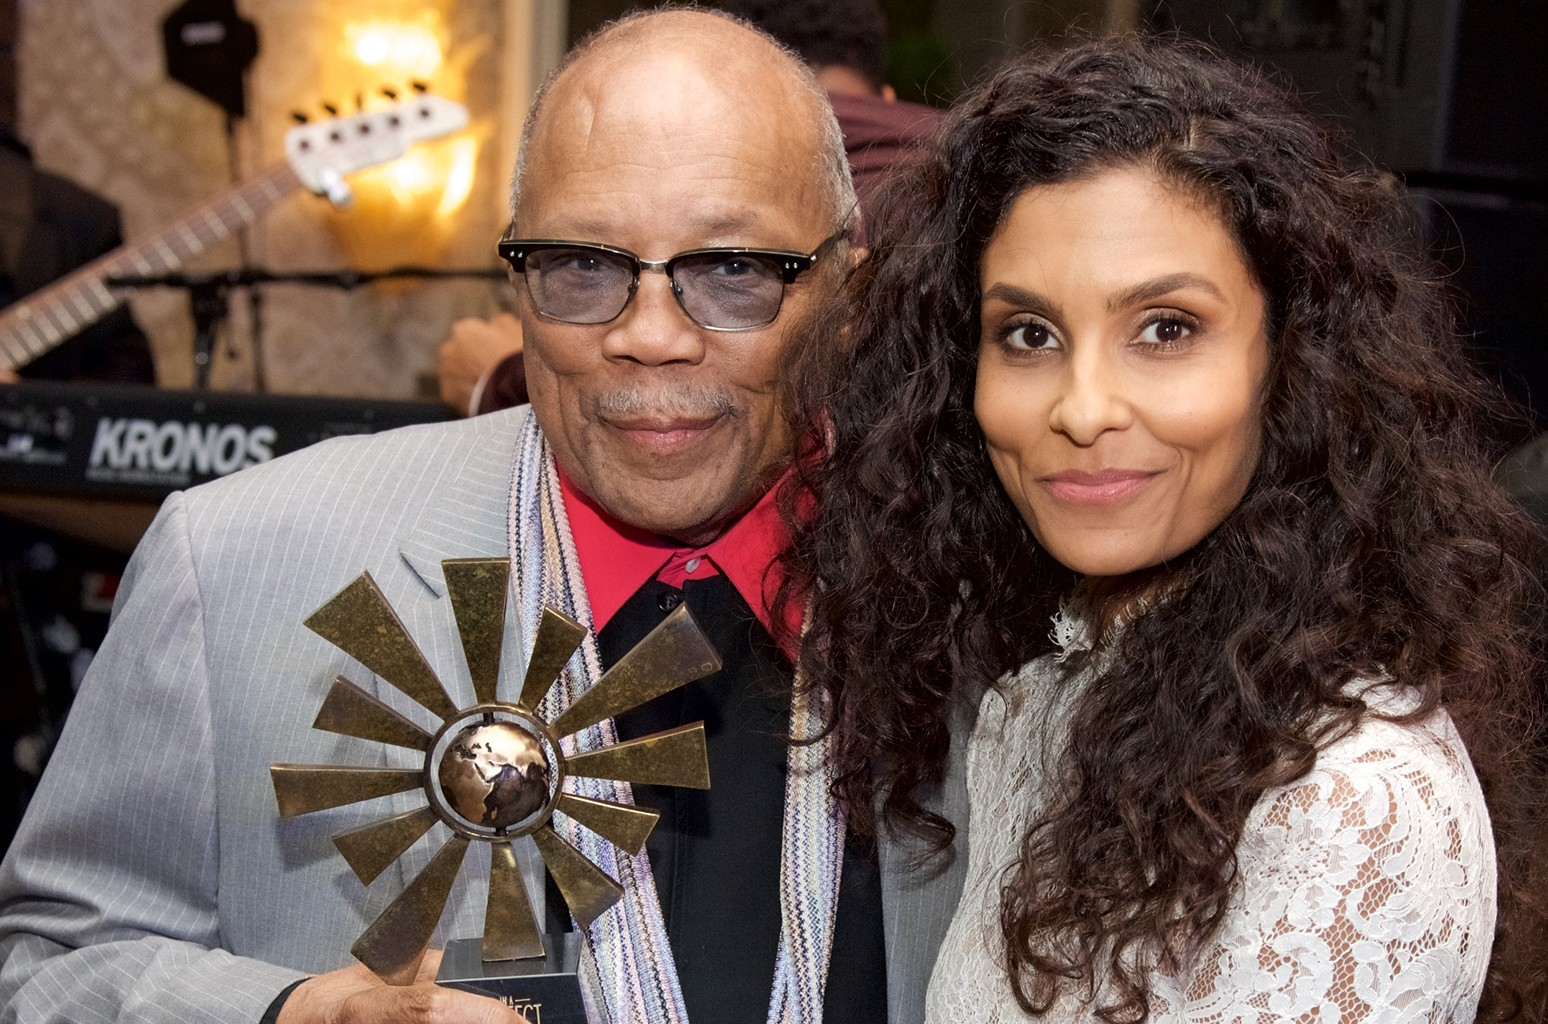 Quincy Jones & Manuela Testolini, 2017